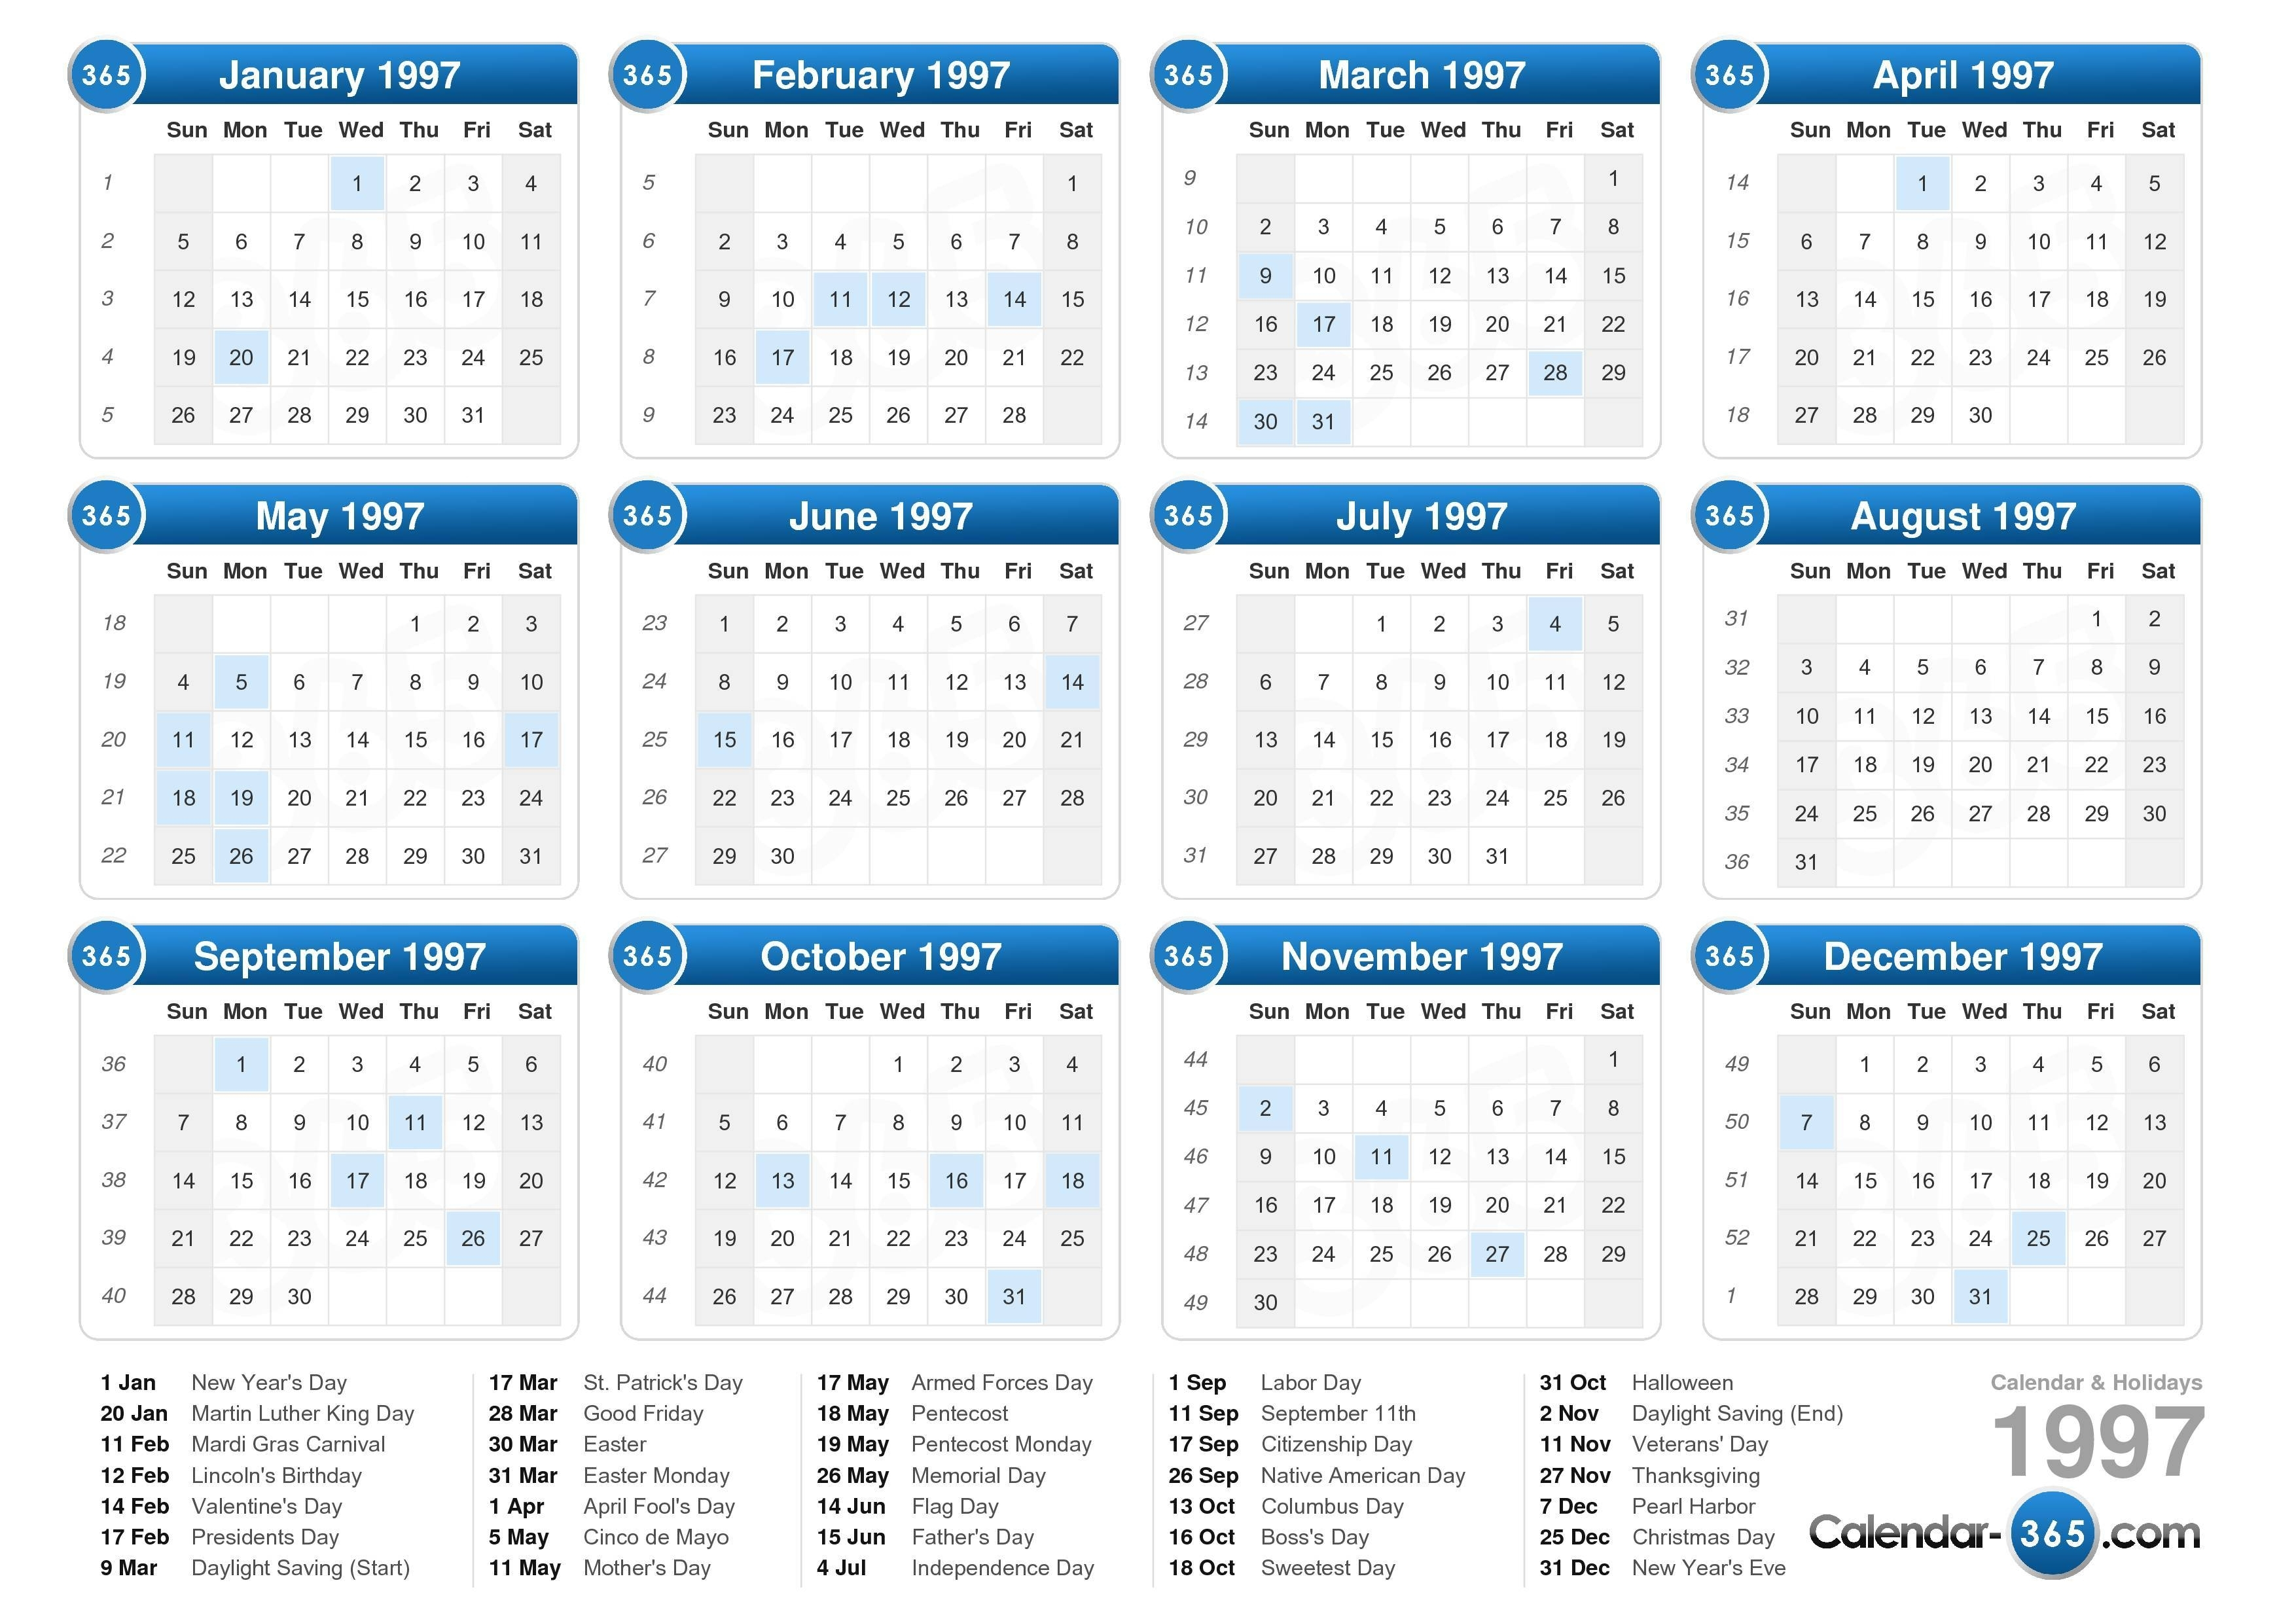 Karnataka Bank Holidays 2020 – Publicholidays.in 2020 Calendar